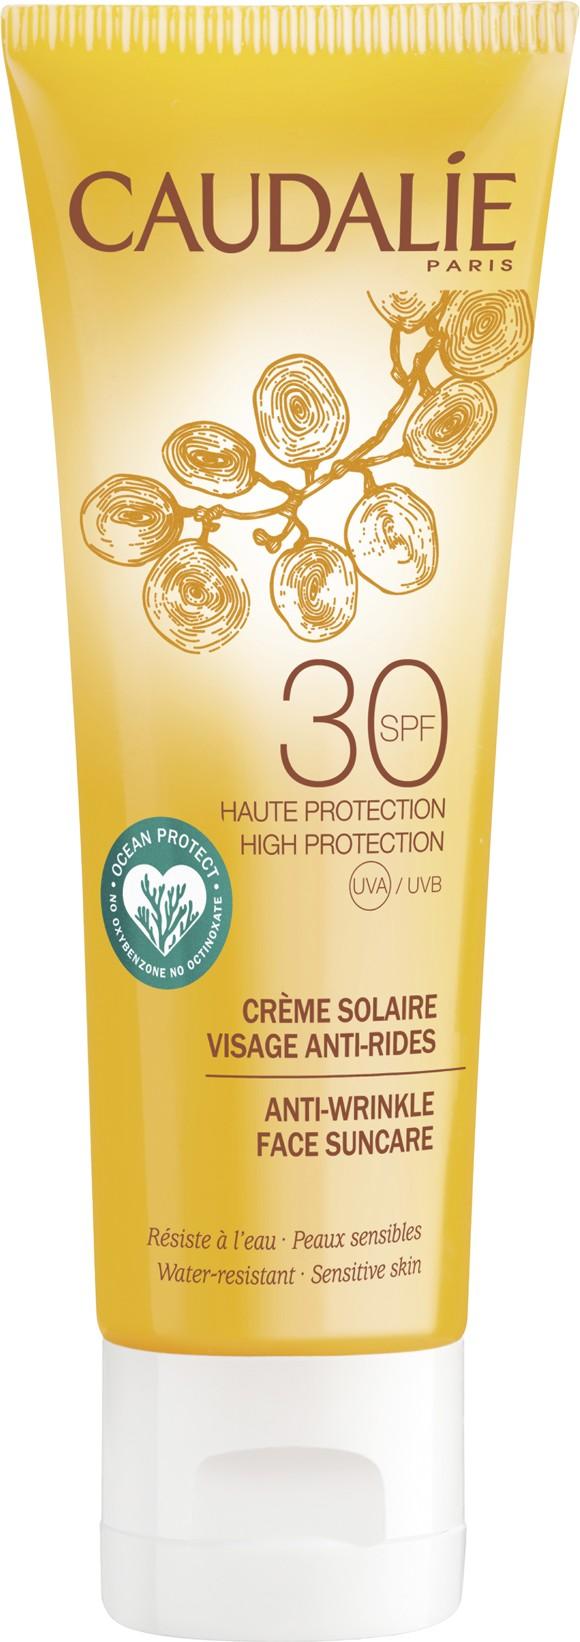 Caudalie - Anti-wrinkle Face Suncare SPF 30 50 ml